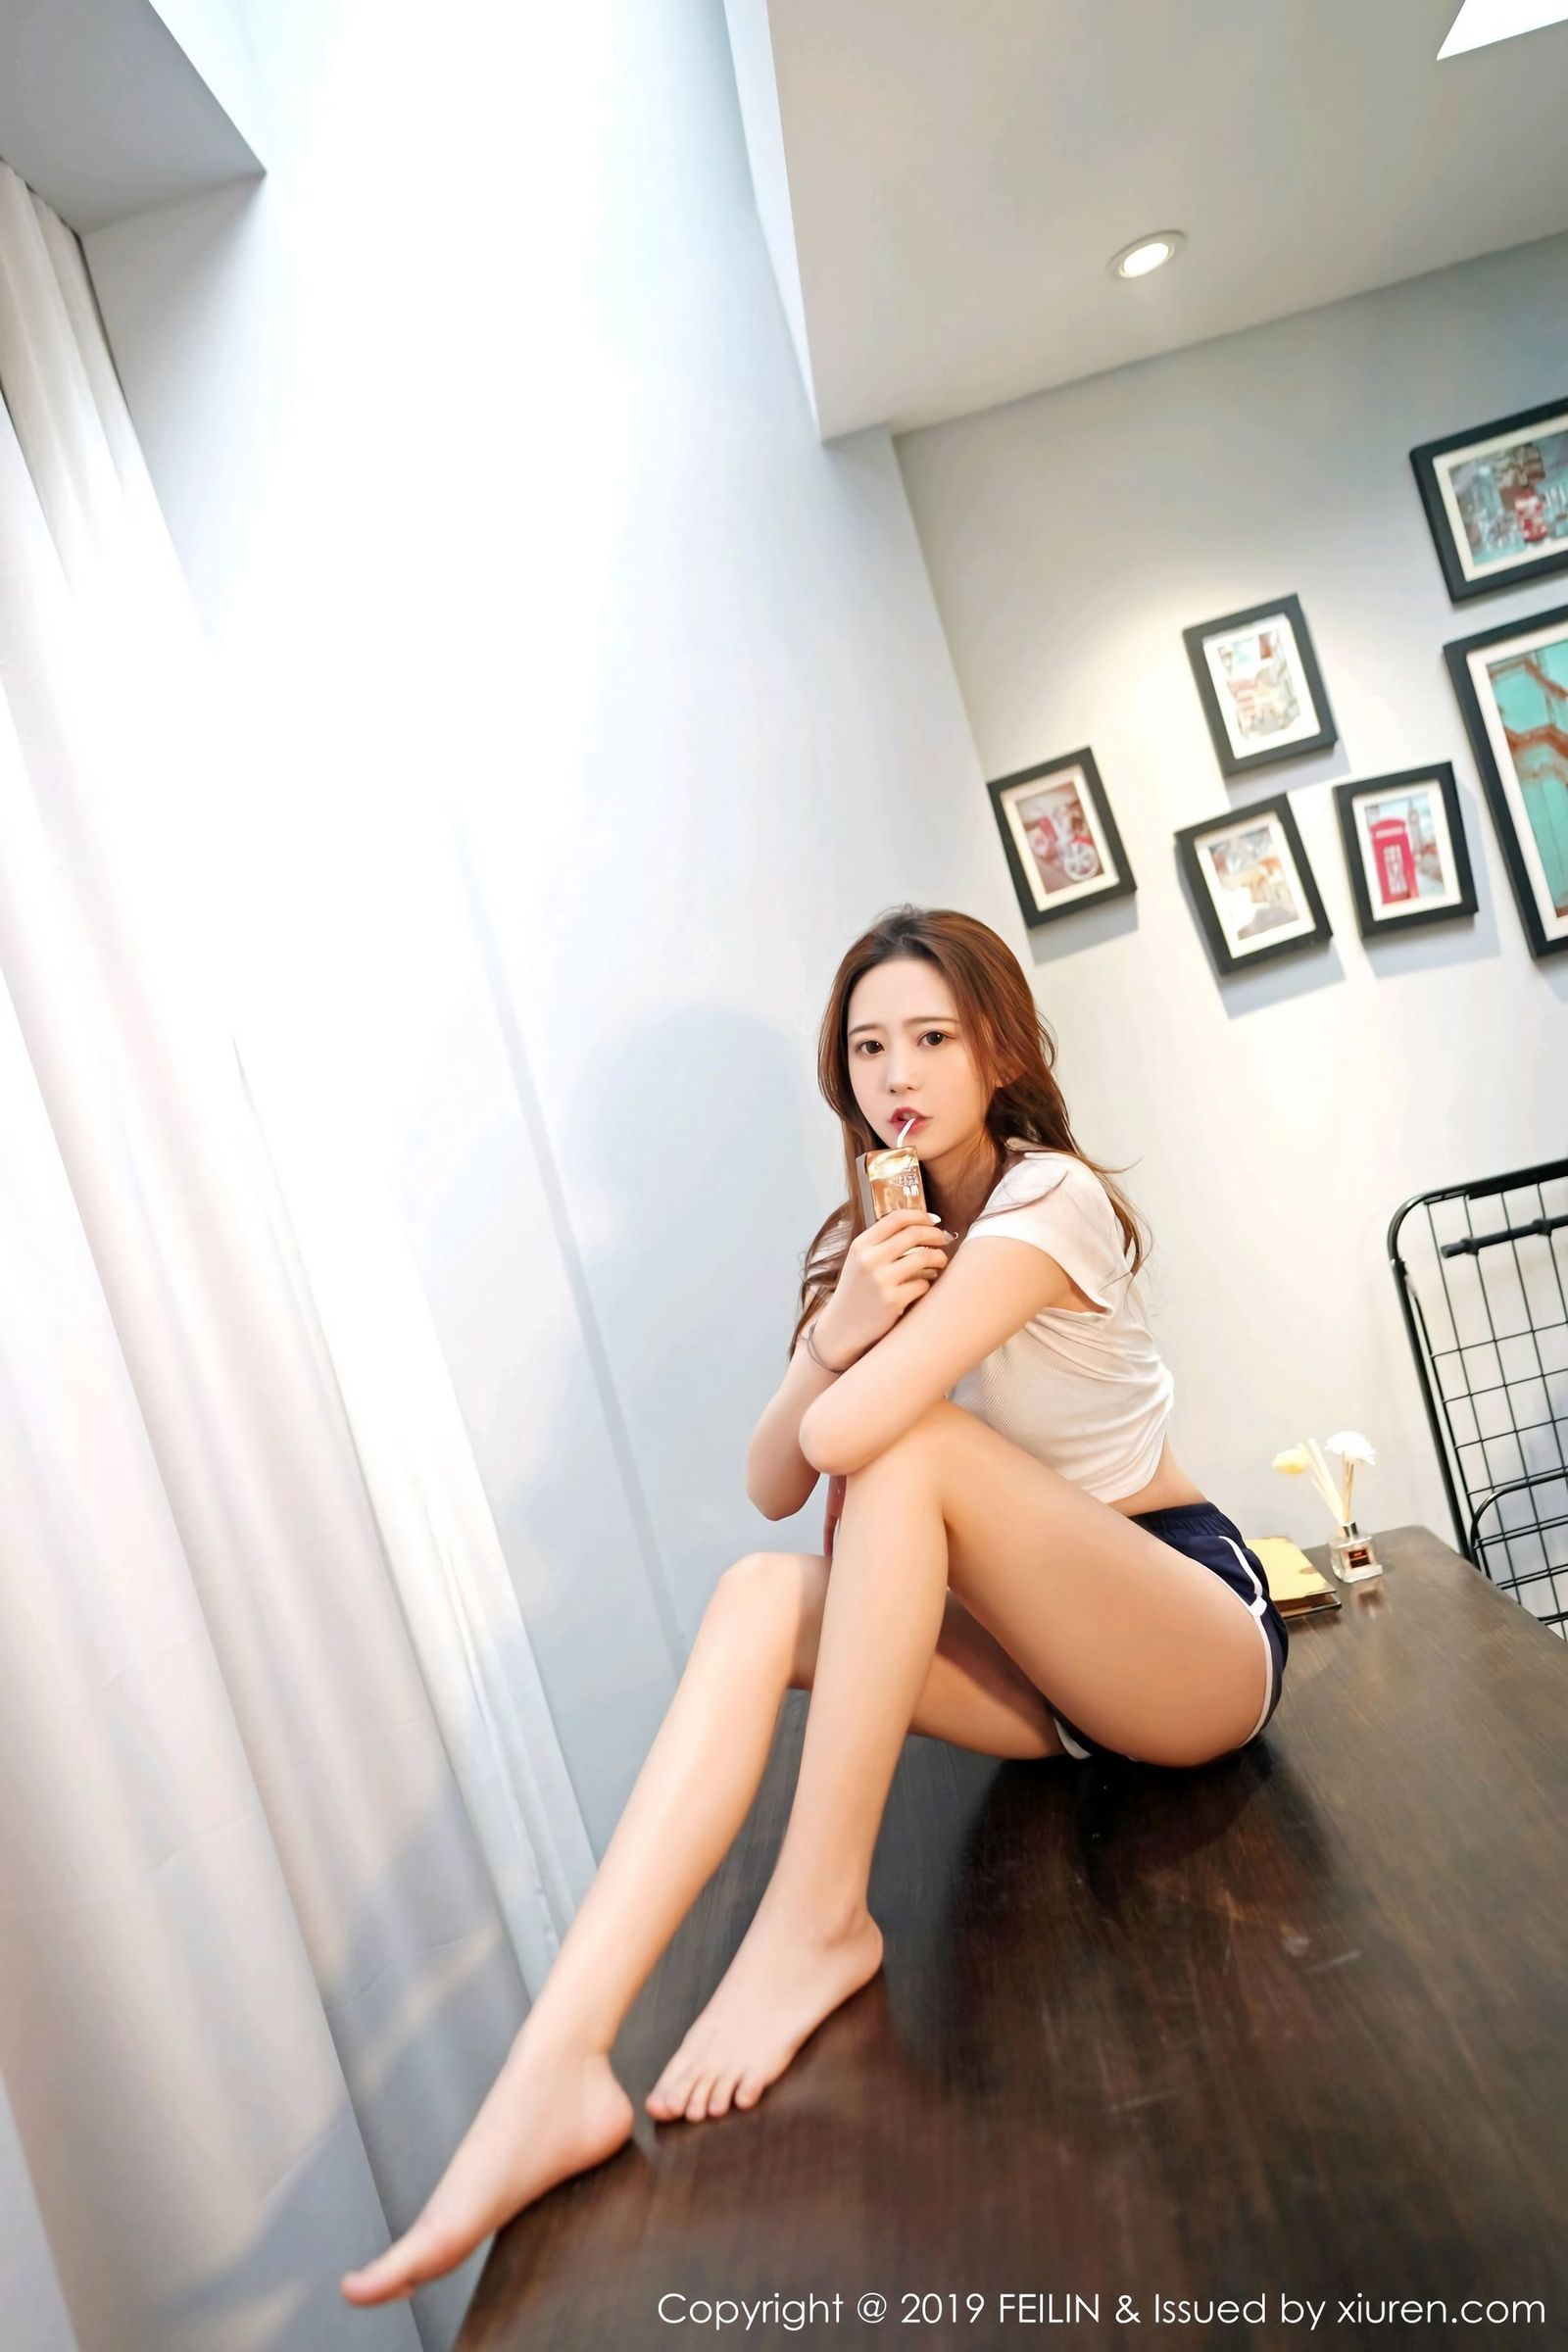 [FEILIN嗲囡囡] Vol.190 清甜美女@张笑宇smile首套丝袜美图[50P]